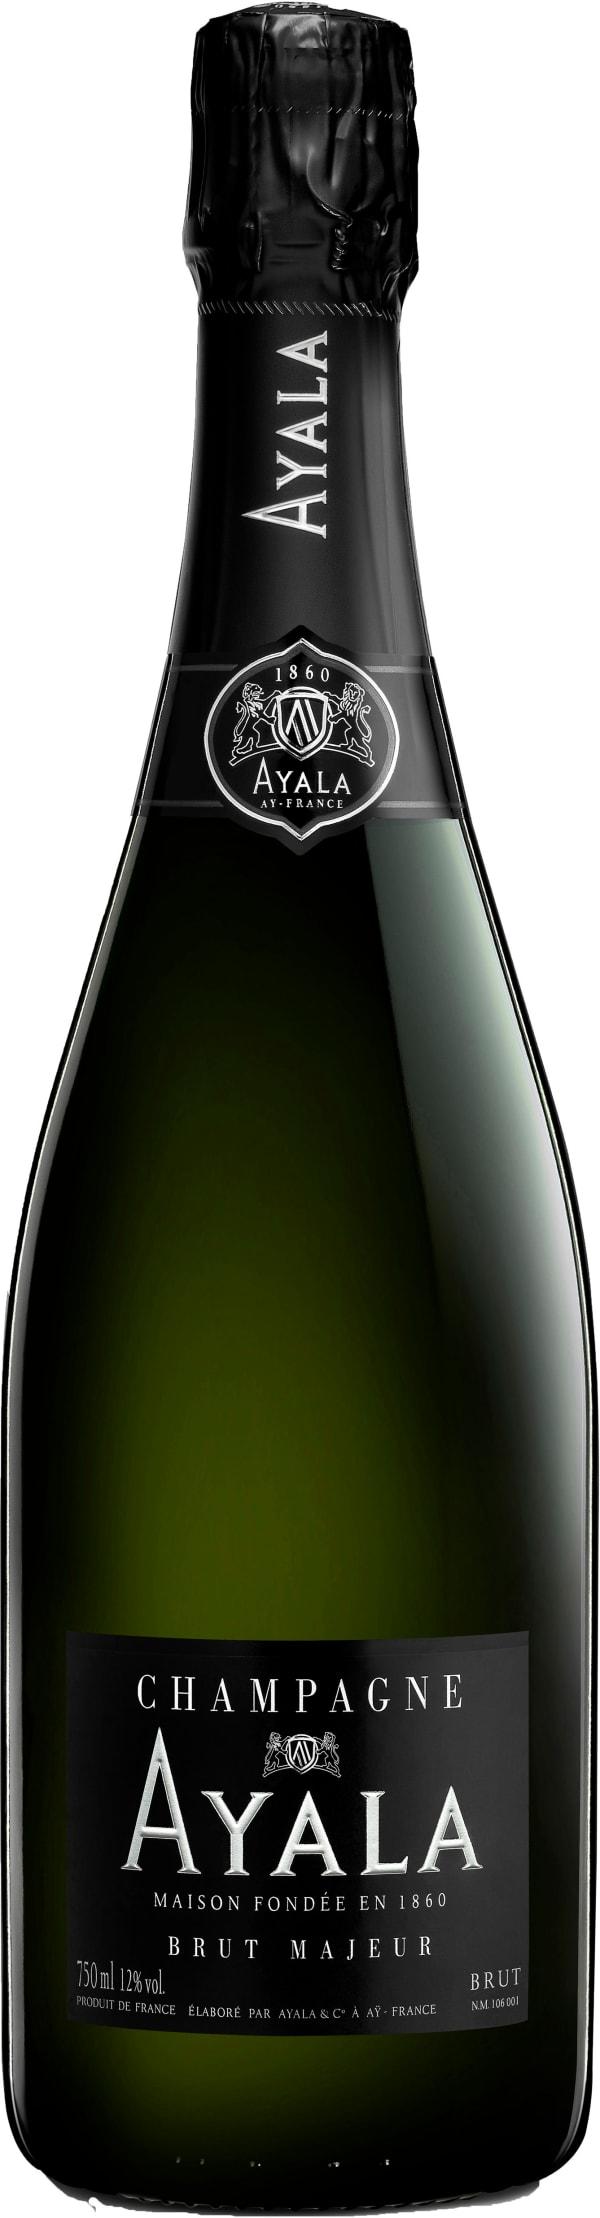 Ayala Majeur Champagne Brut